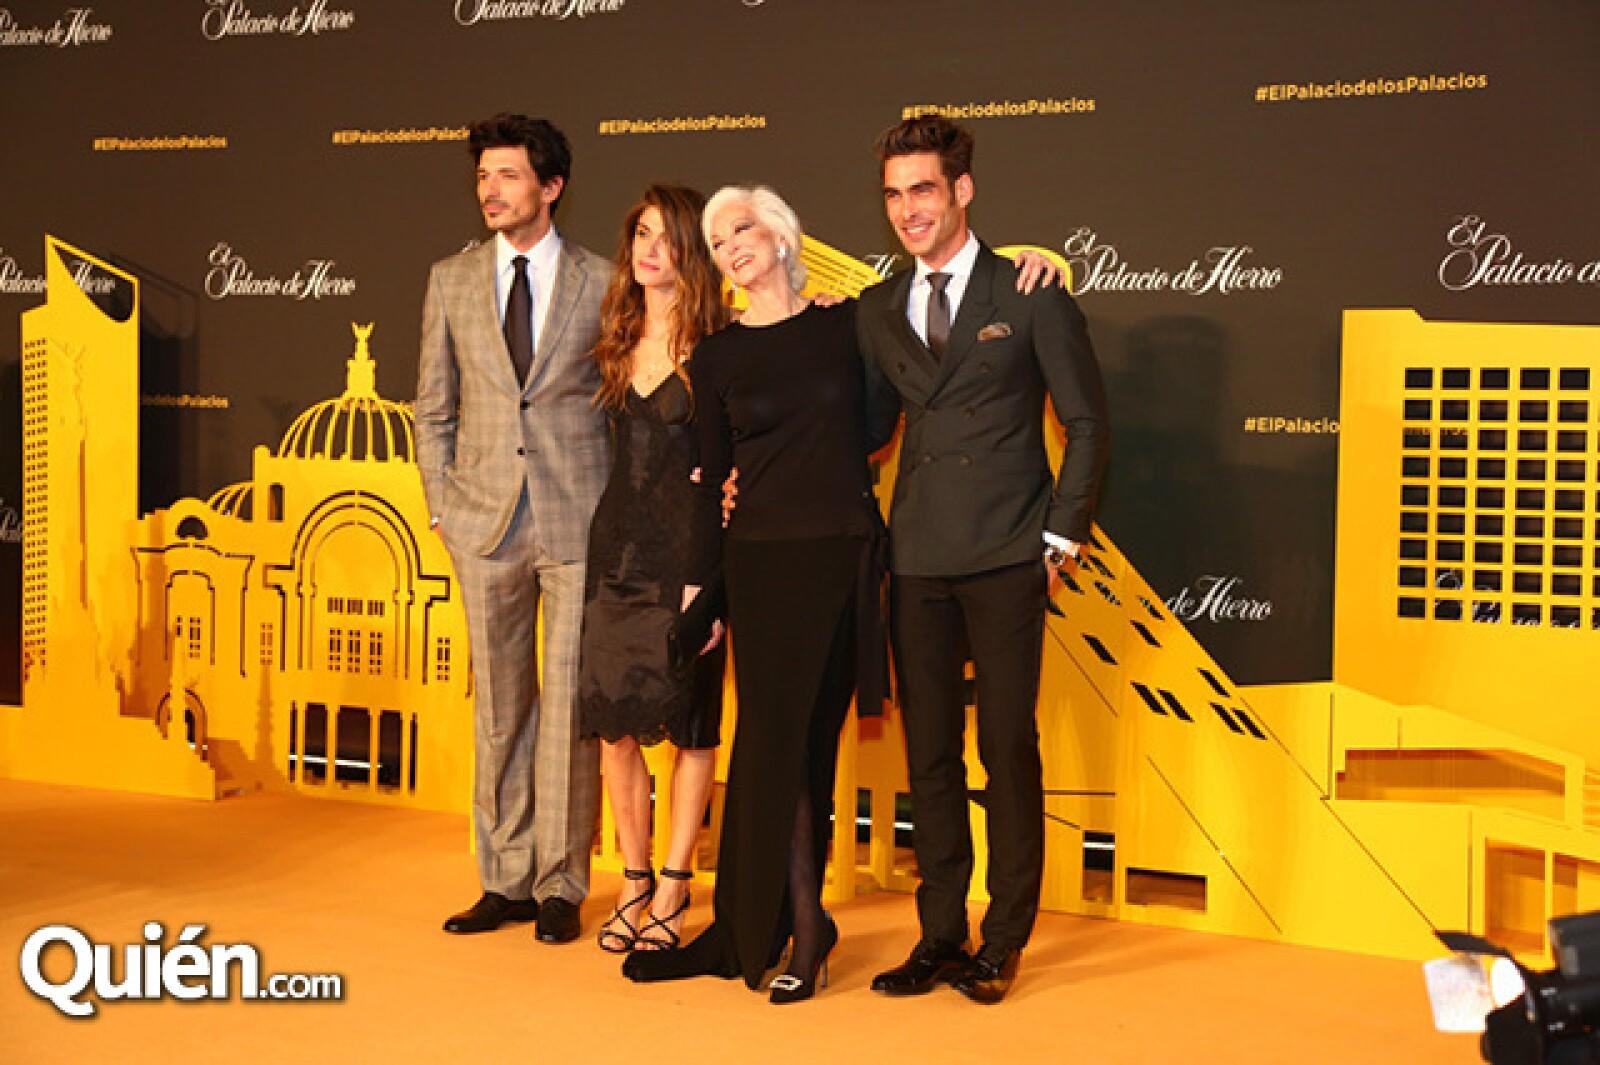 Andrés Velencoso,Elisa Cednauri,Carmen Dell`Orefice y Jon Kortajarena